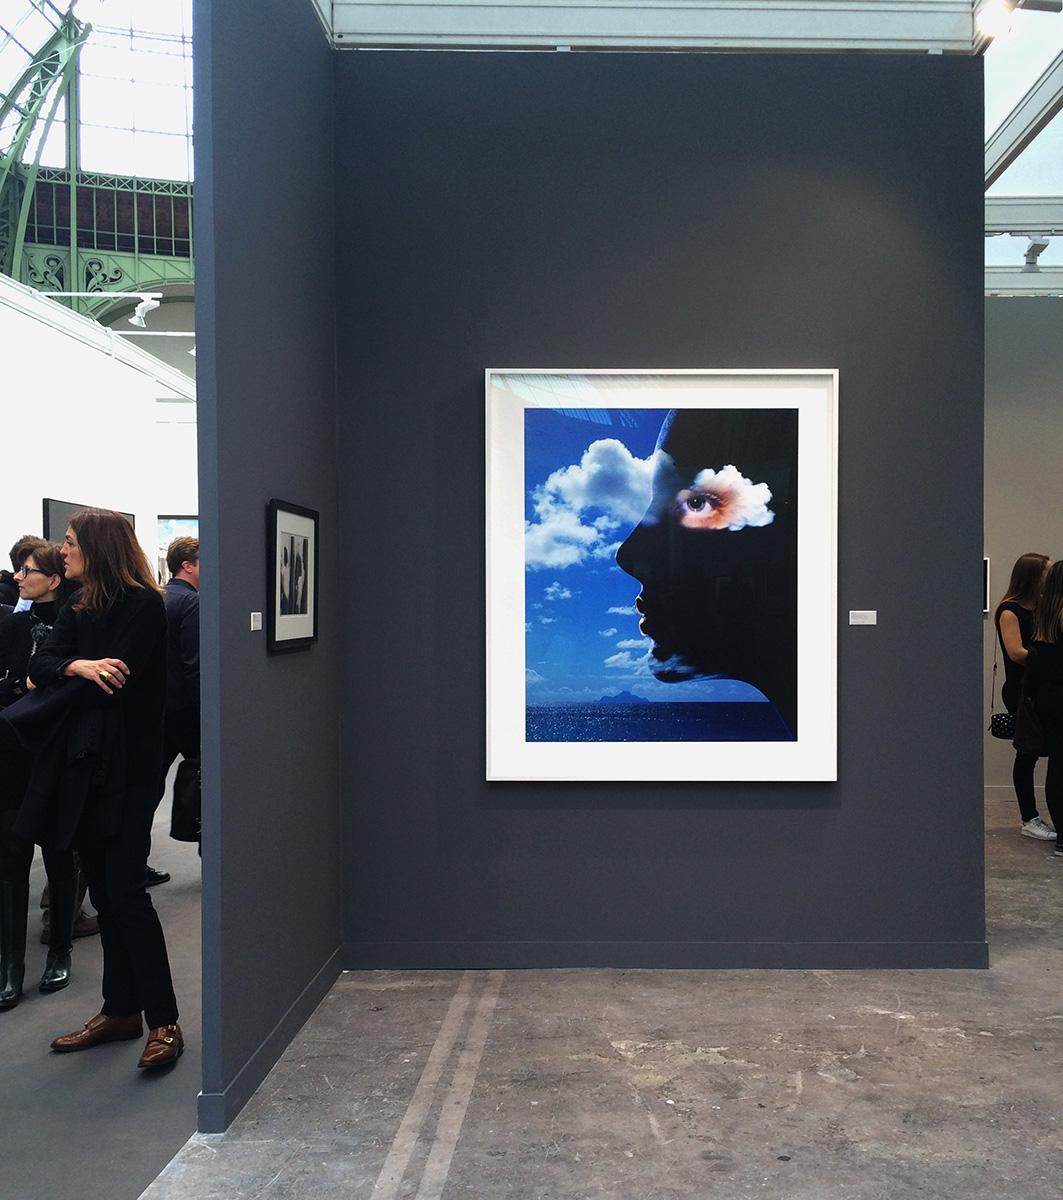 HIRO, Pace/MacGill Gallery, Paris Photo, 2015